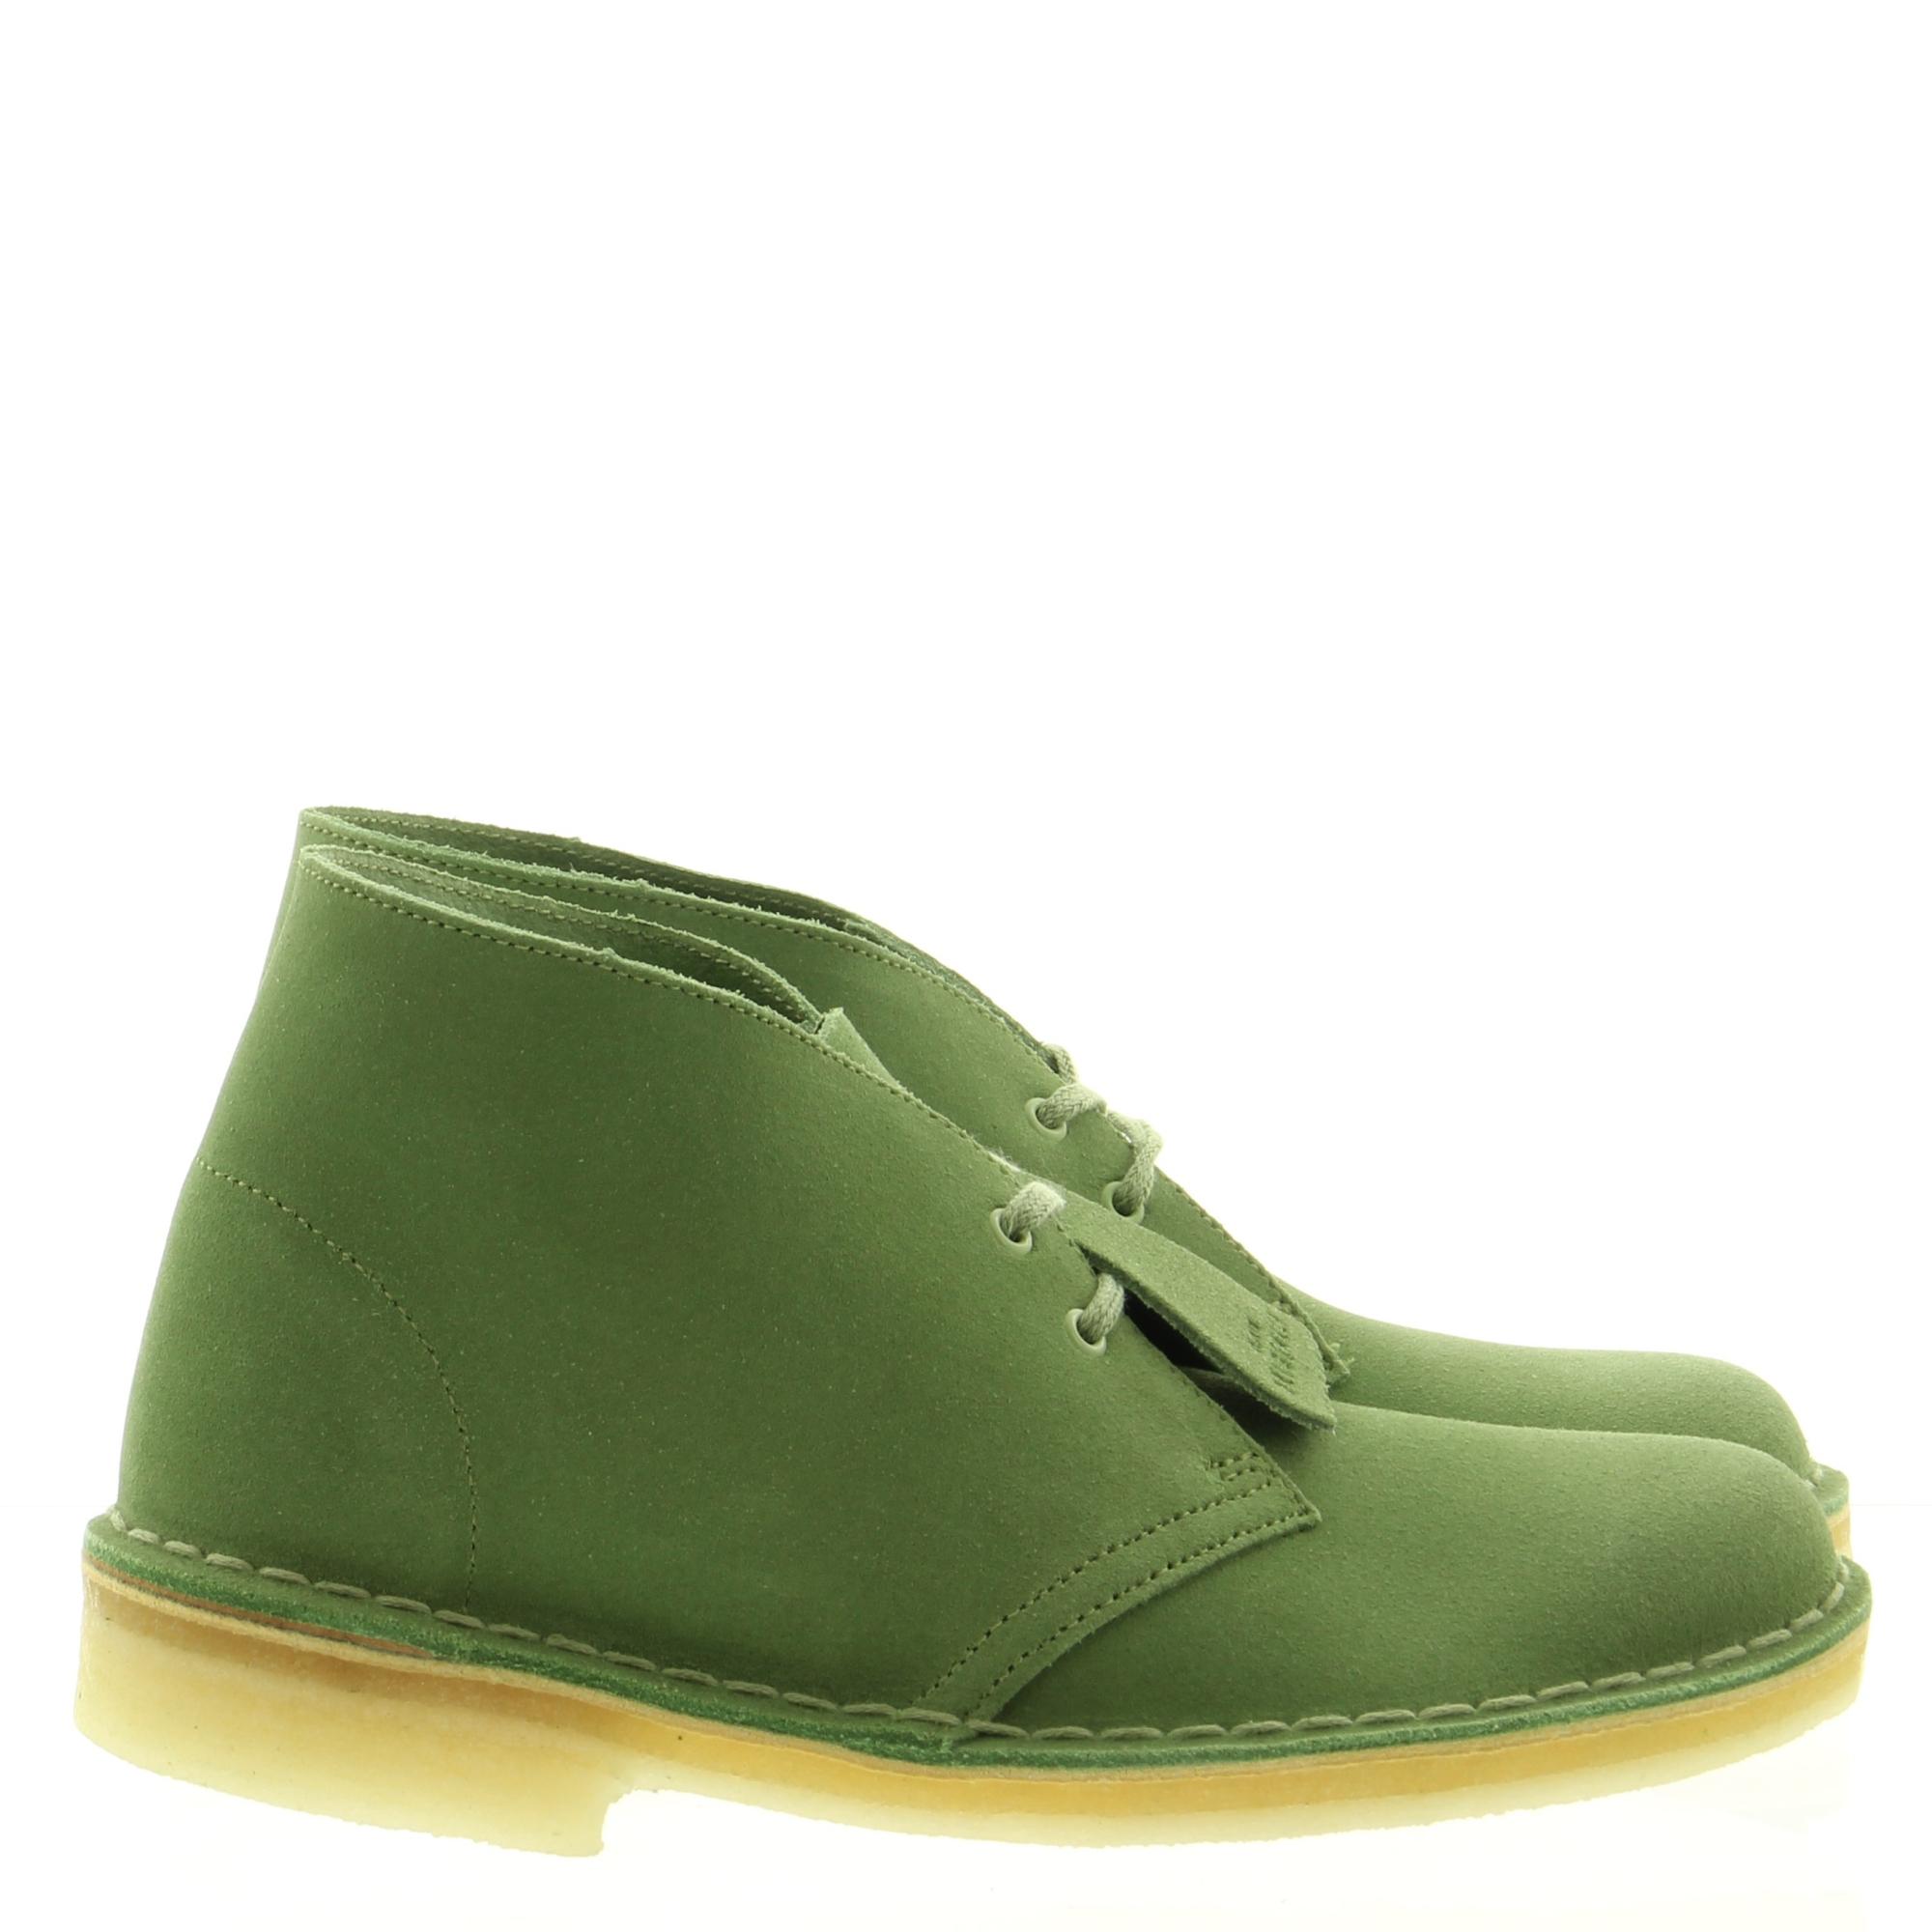 Clarks 26138825 Desert Boot Cactus